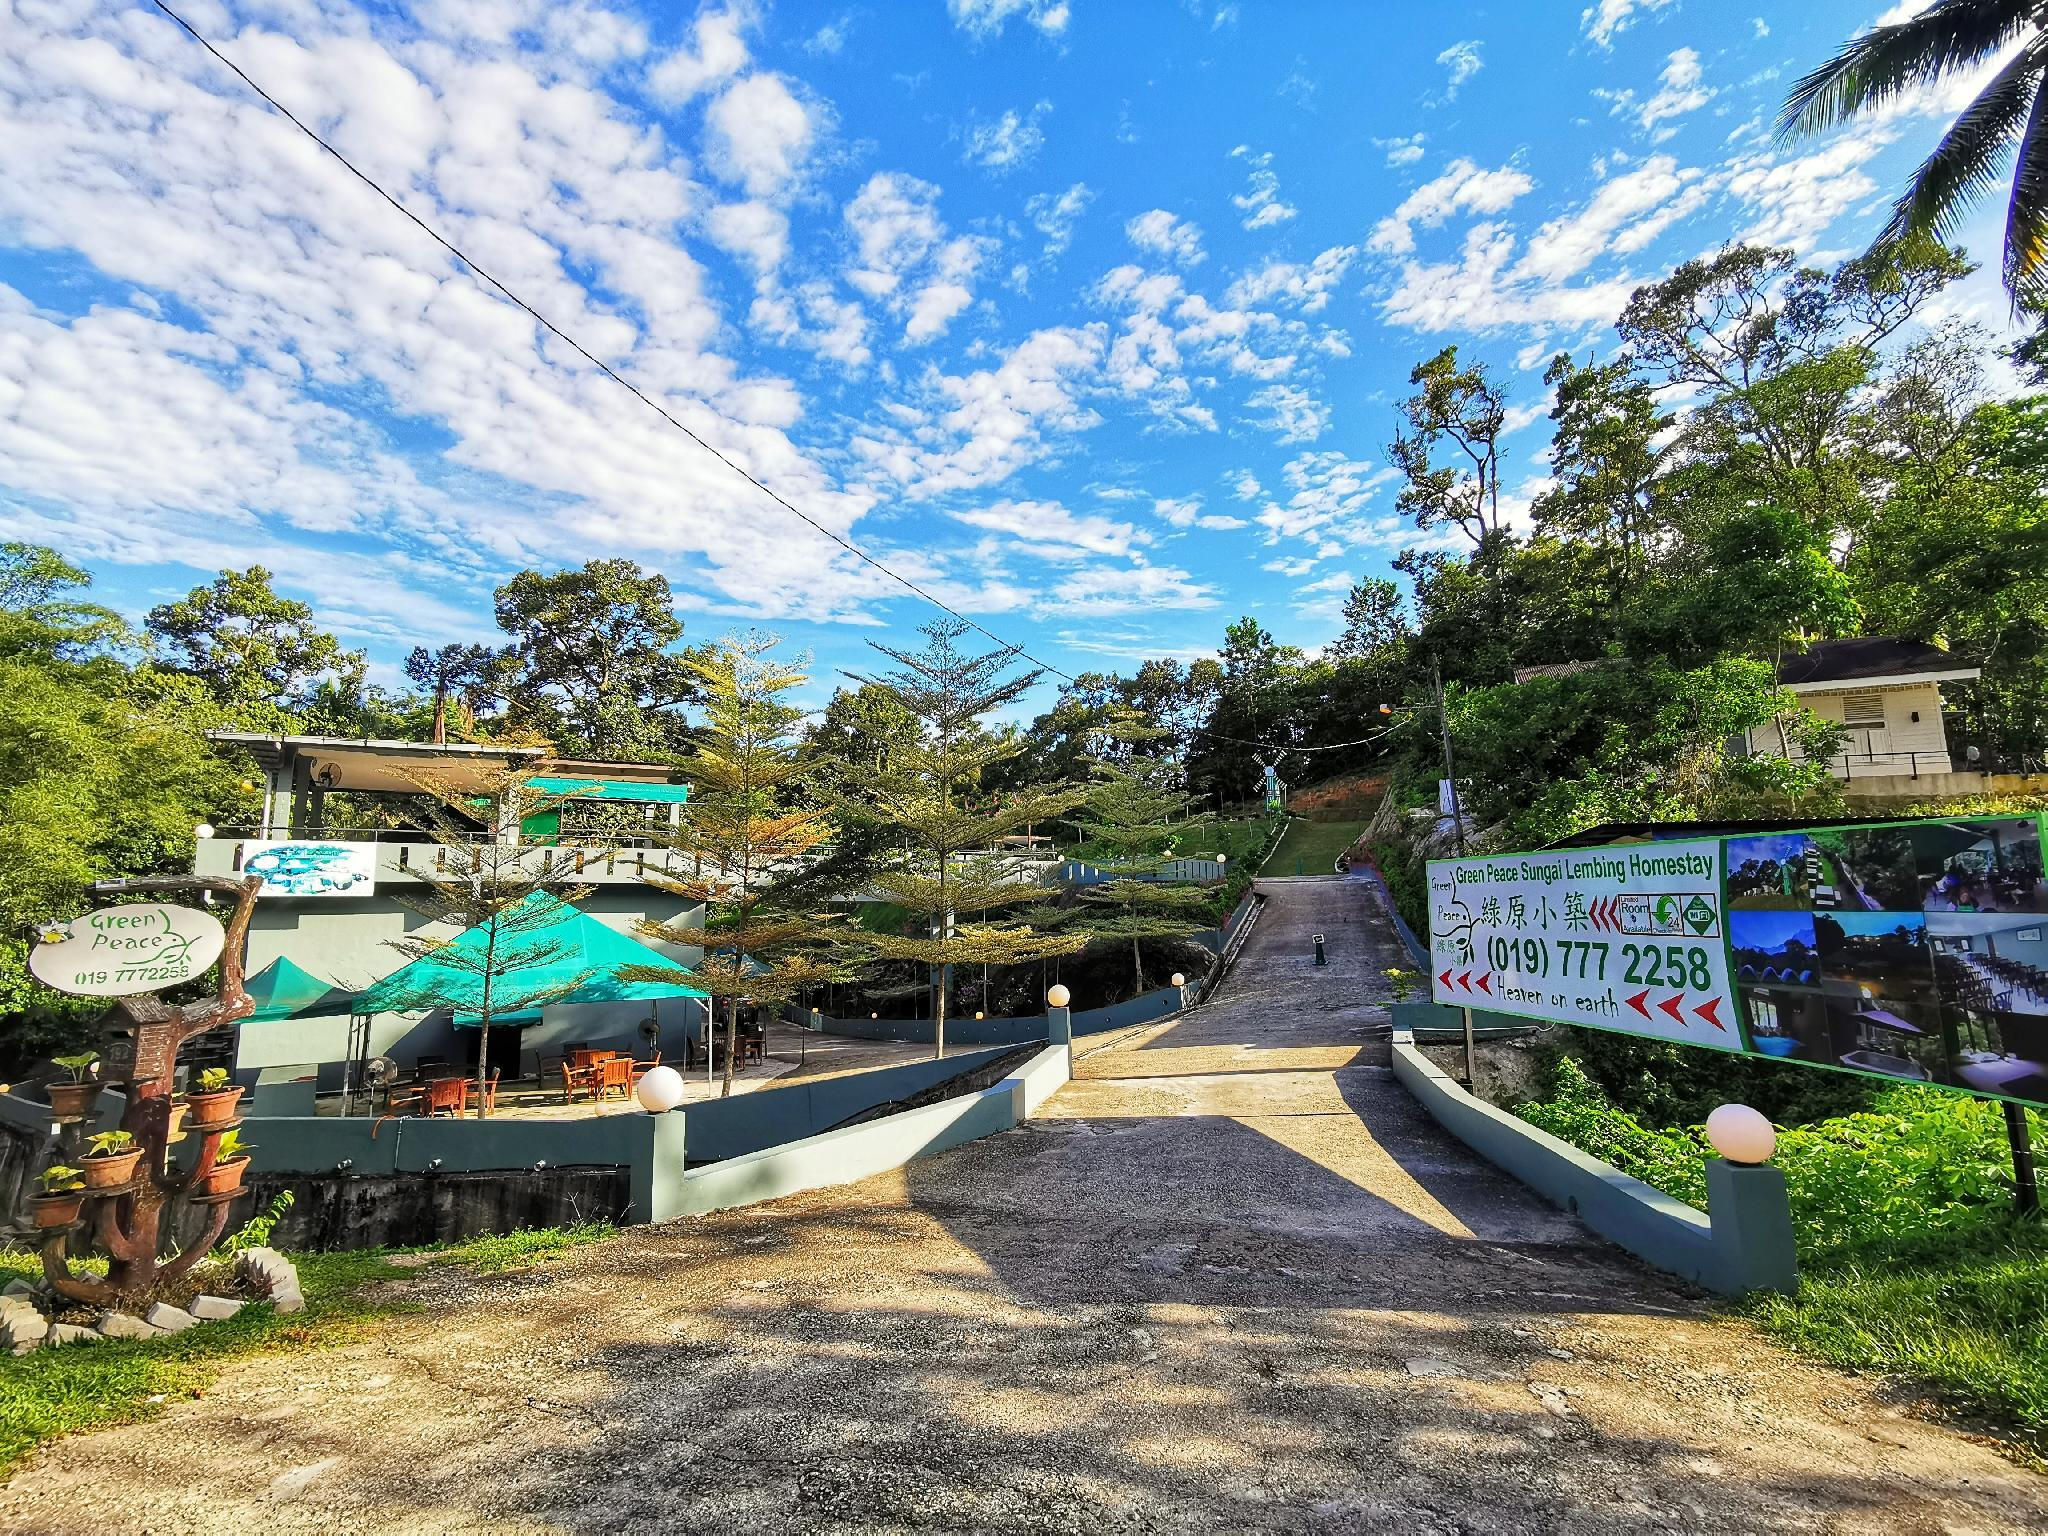 Green Peace Sungai Lembing